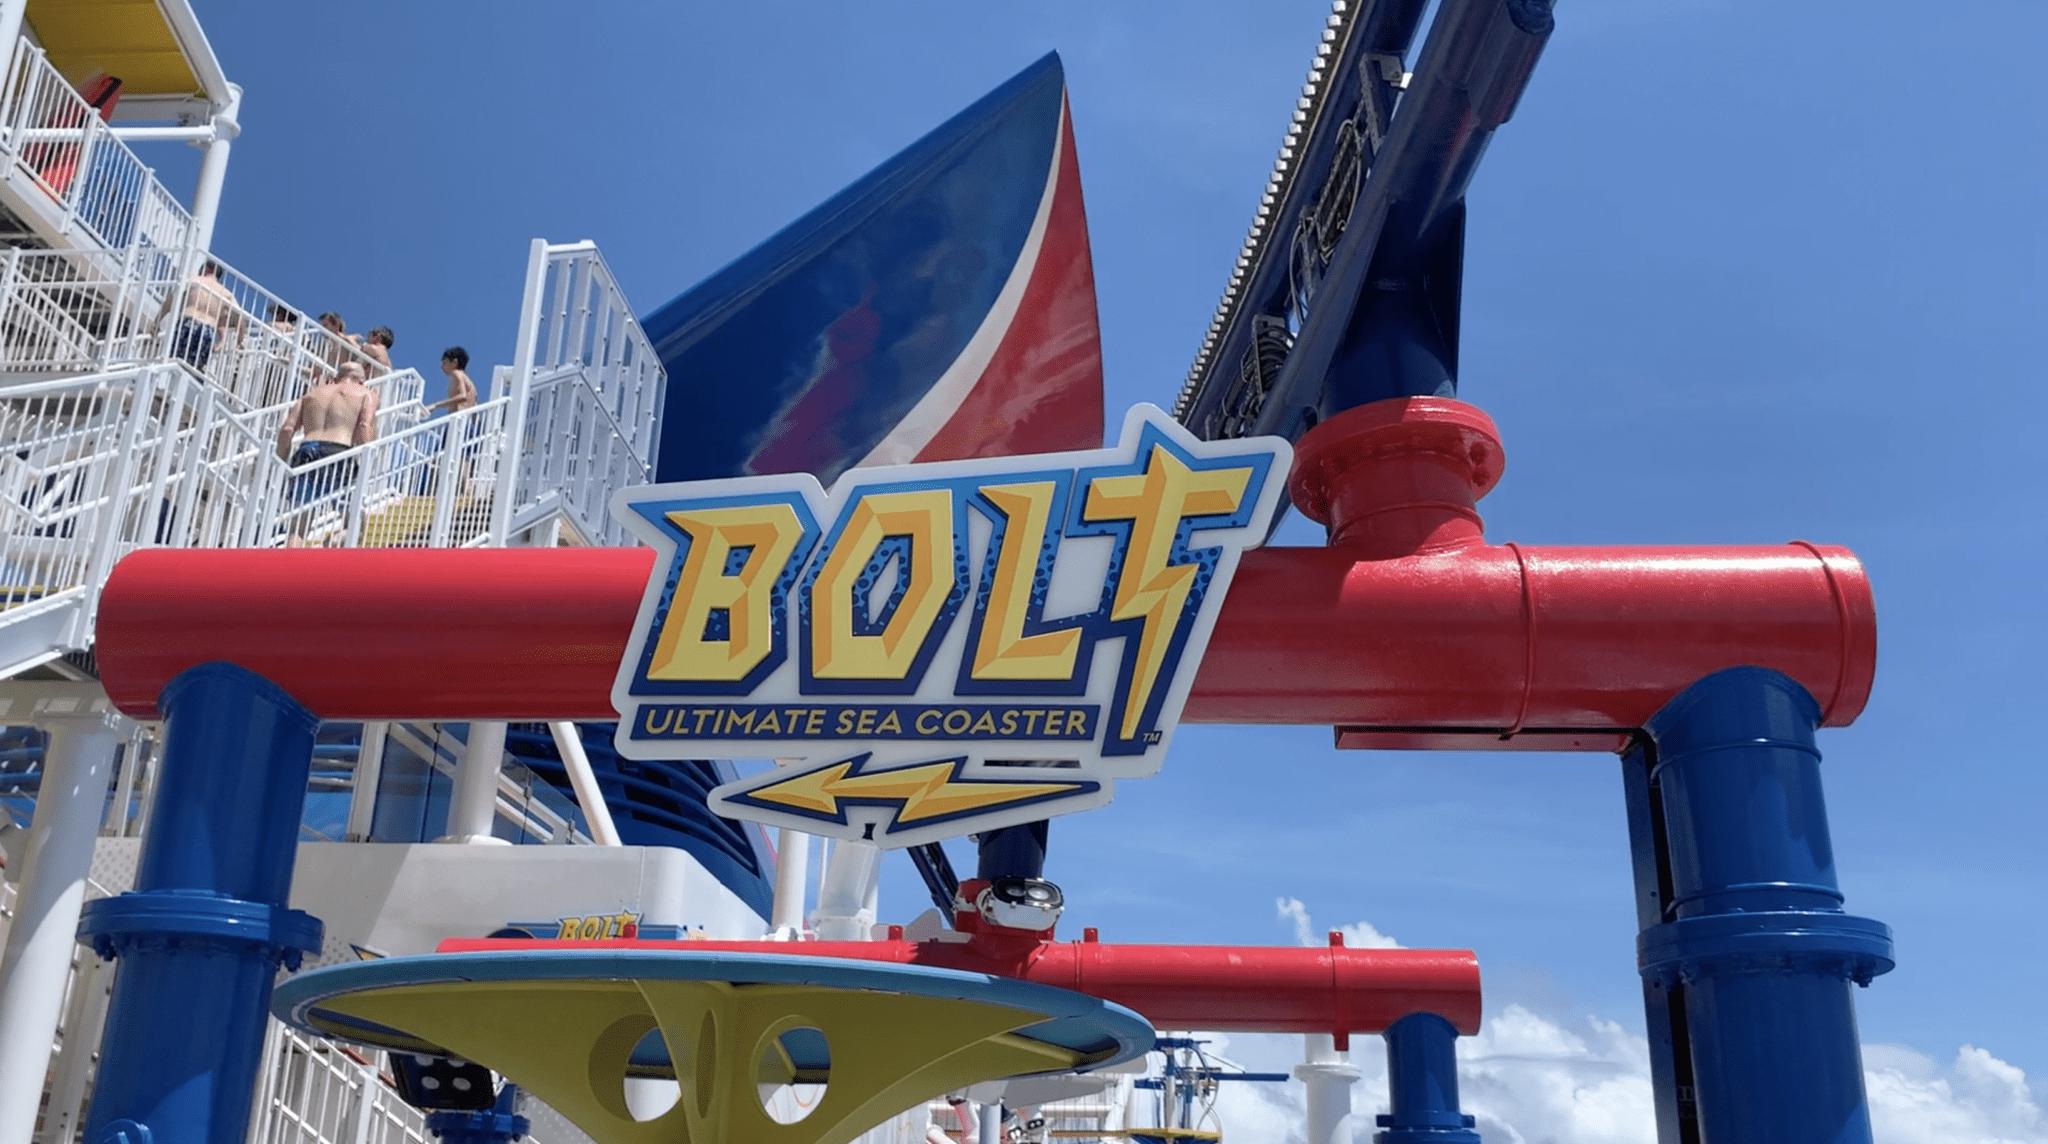 bolt roller coaster sign mardi gras